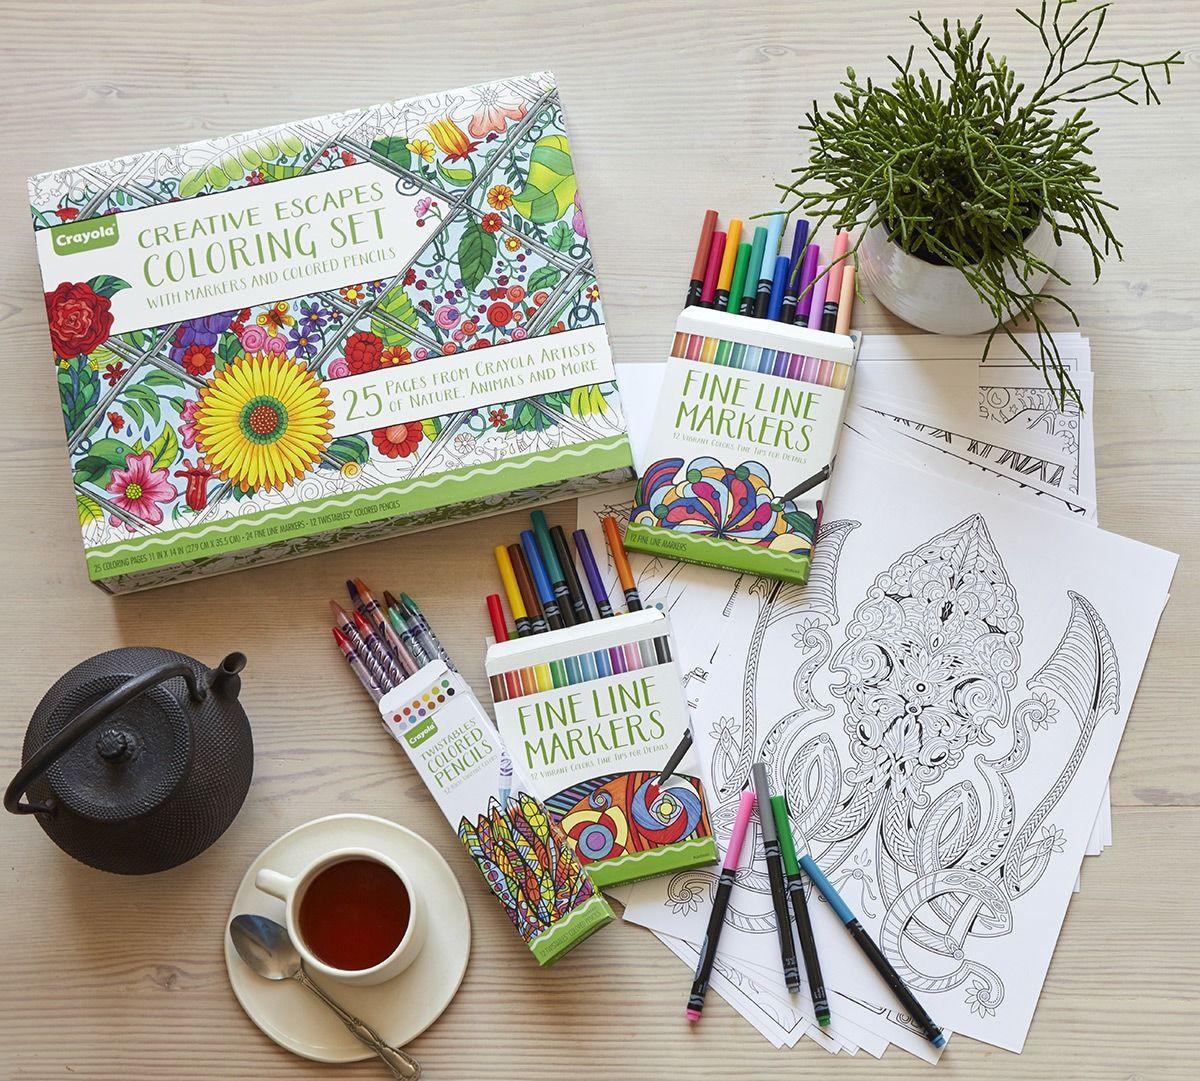 Adult Coloring Book Sets  Creative Escapes Coloring Set Gift Set Crayola